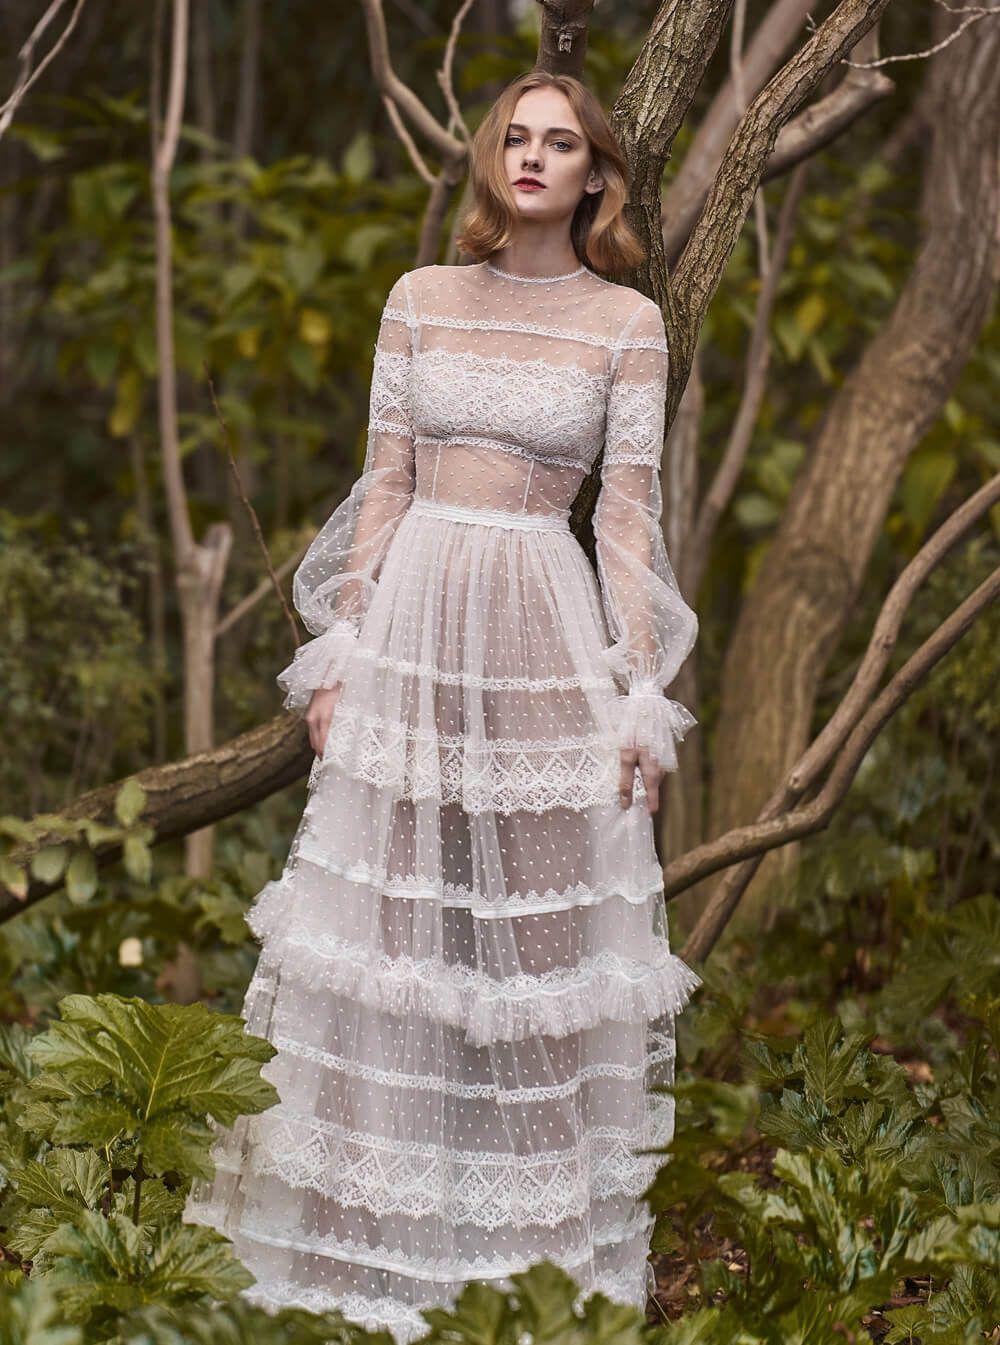 140 Best Bohemian Wedding Dresses - Boho Wedding Dress Ideas for ...